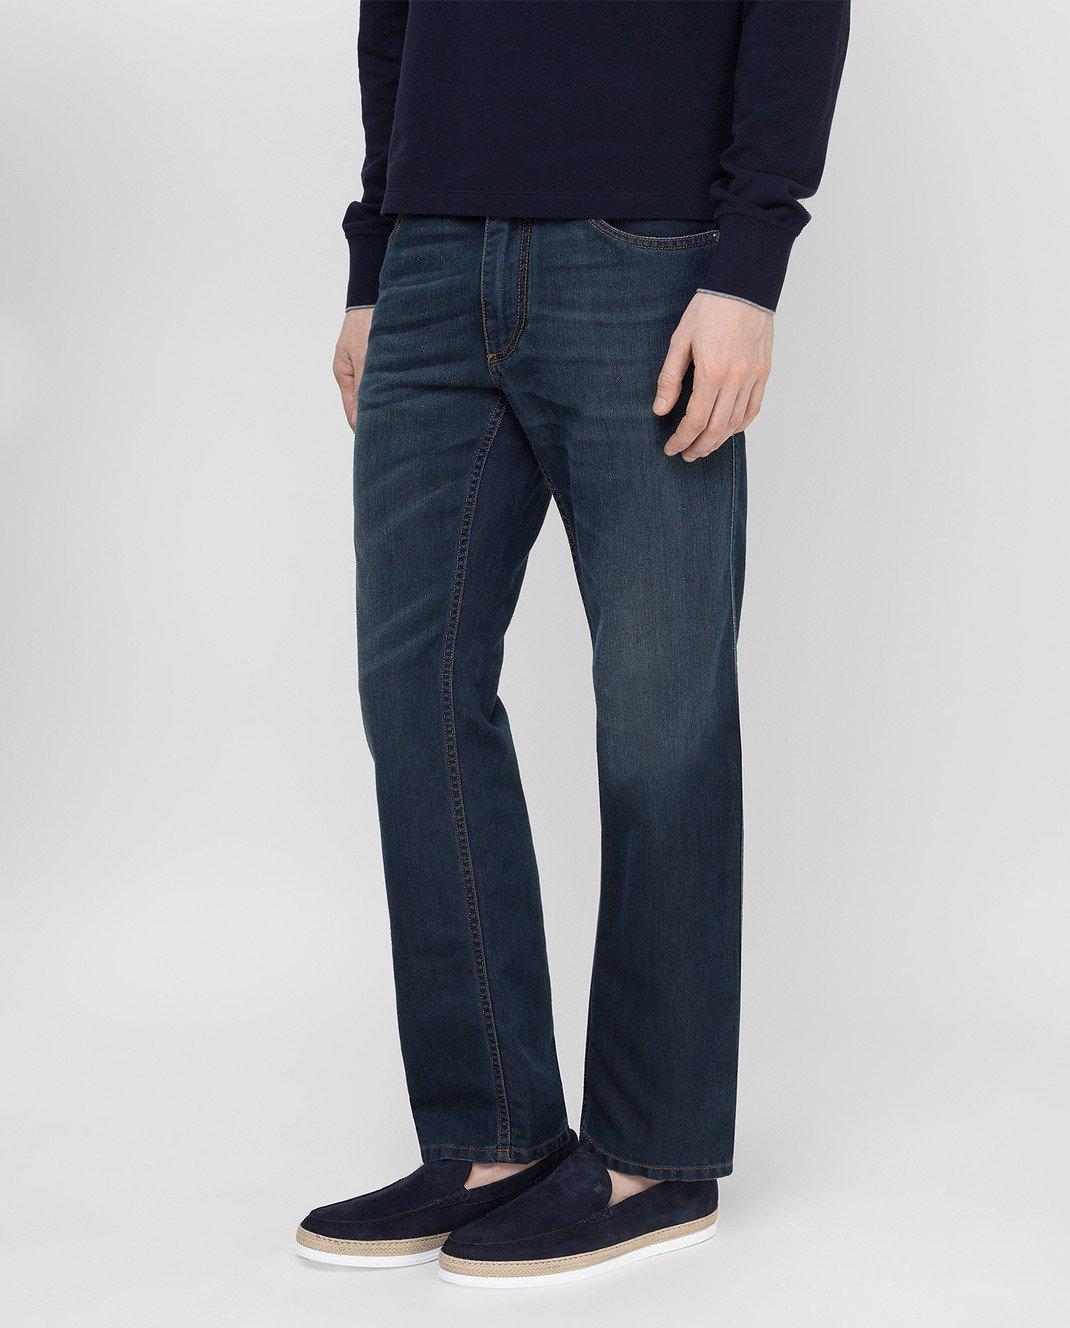 Ferutdin Zakirov Темно-синие джинсы FZA4900JN4000 изображение 3